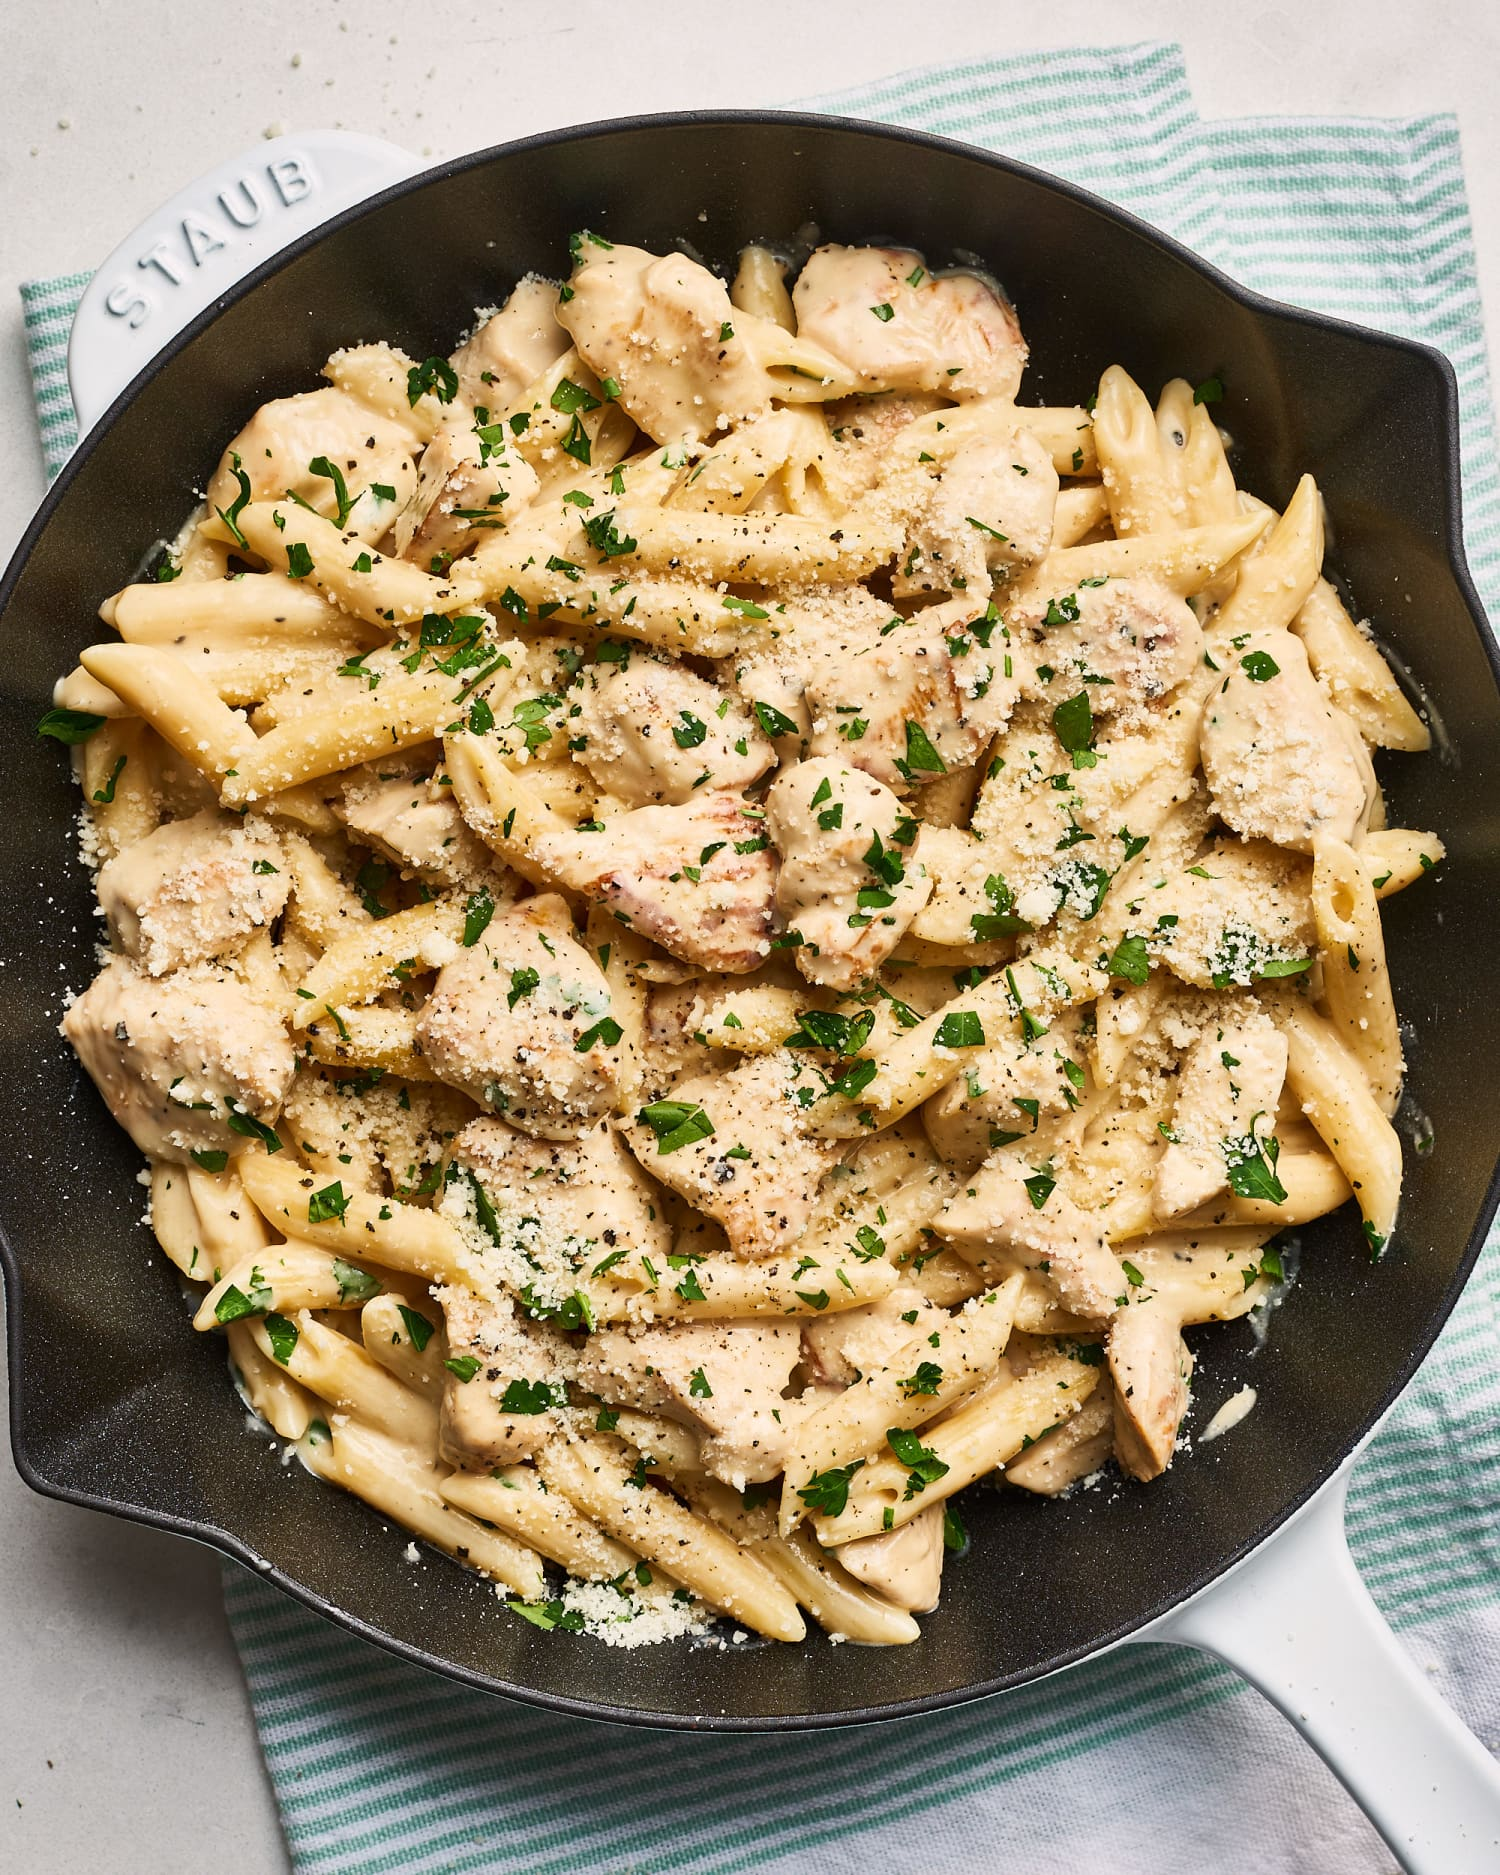 Recipe: One-Skillet Chicken Alfredo Pasta